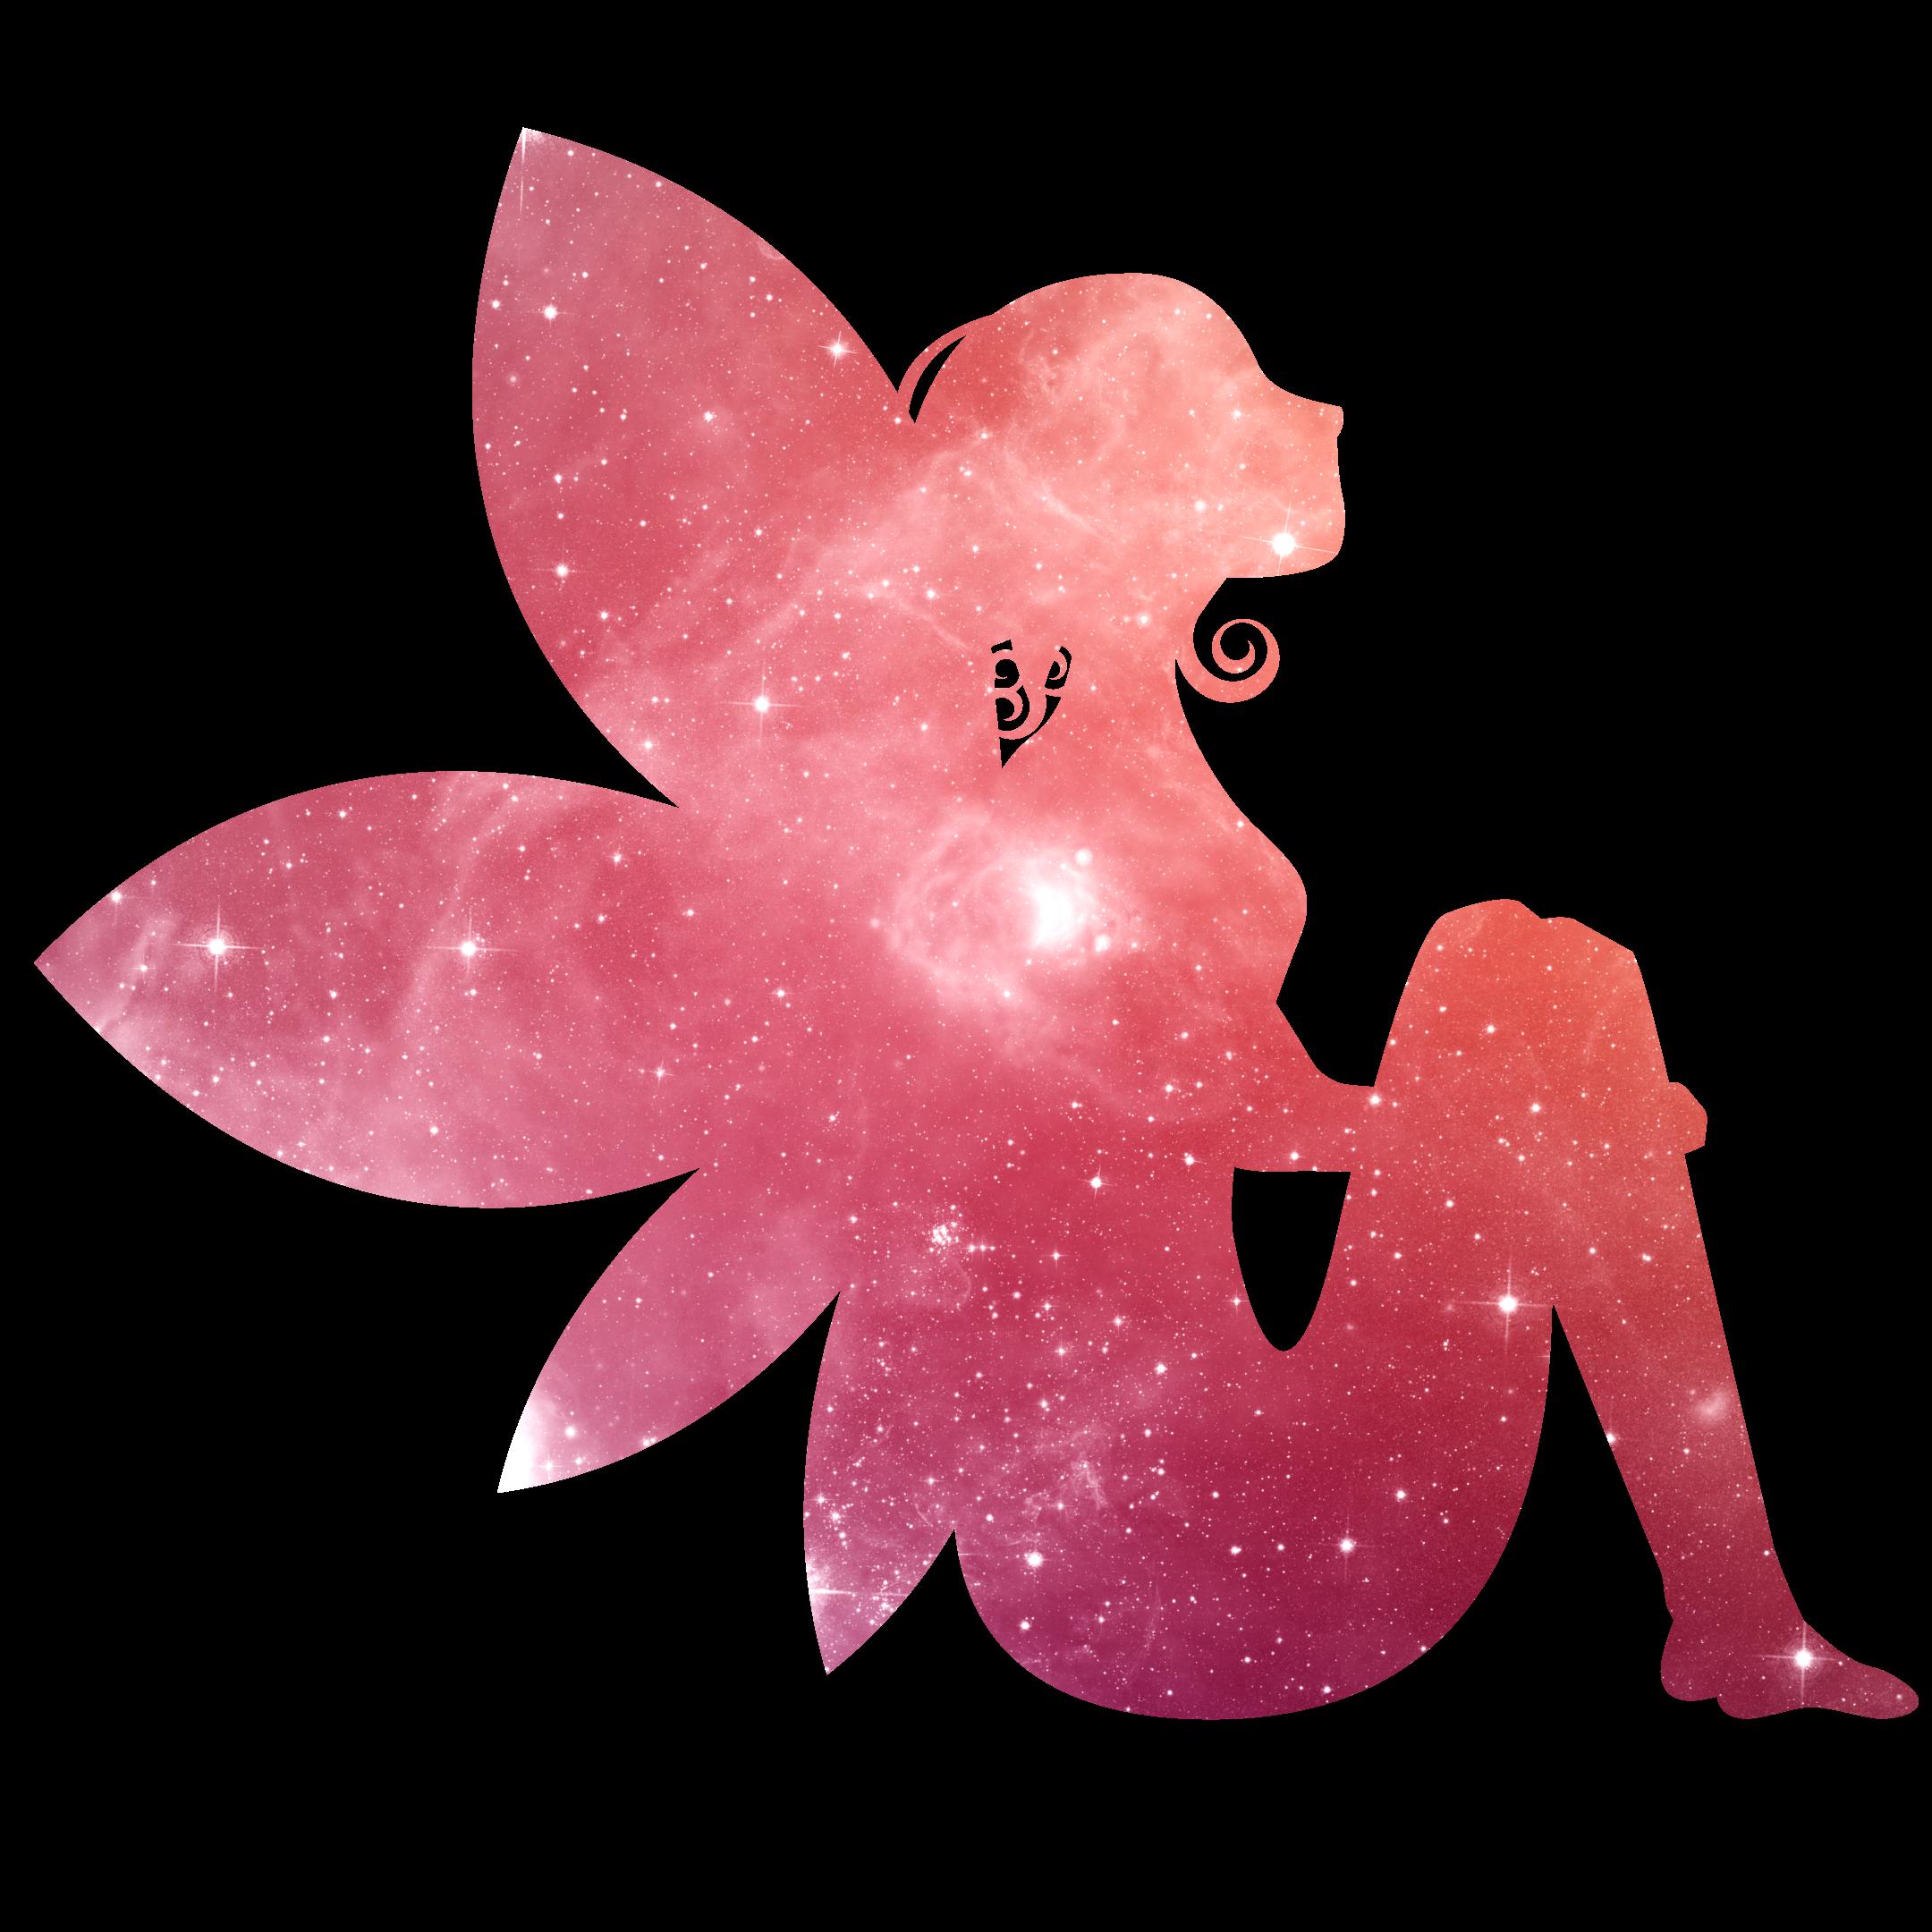 Fee Elfe rot Glitzer Universum Sternenhimmel magisch verzaubert